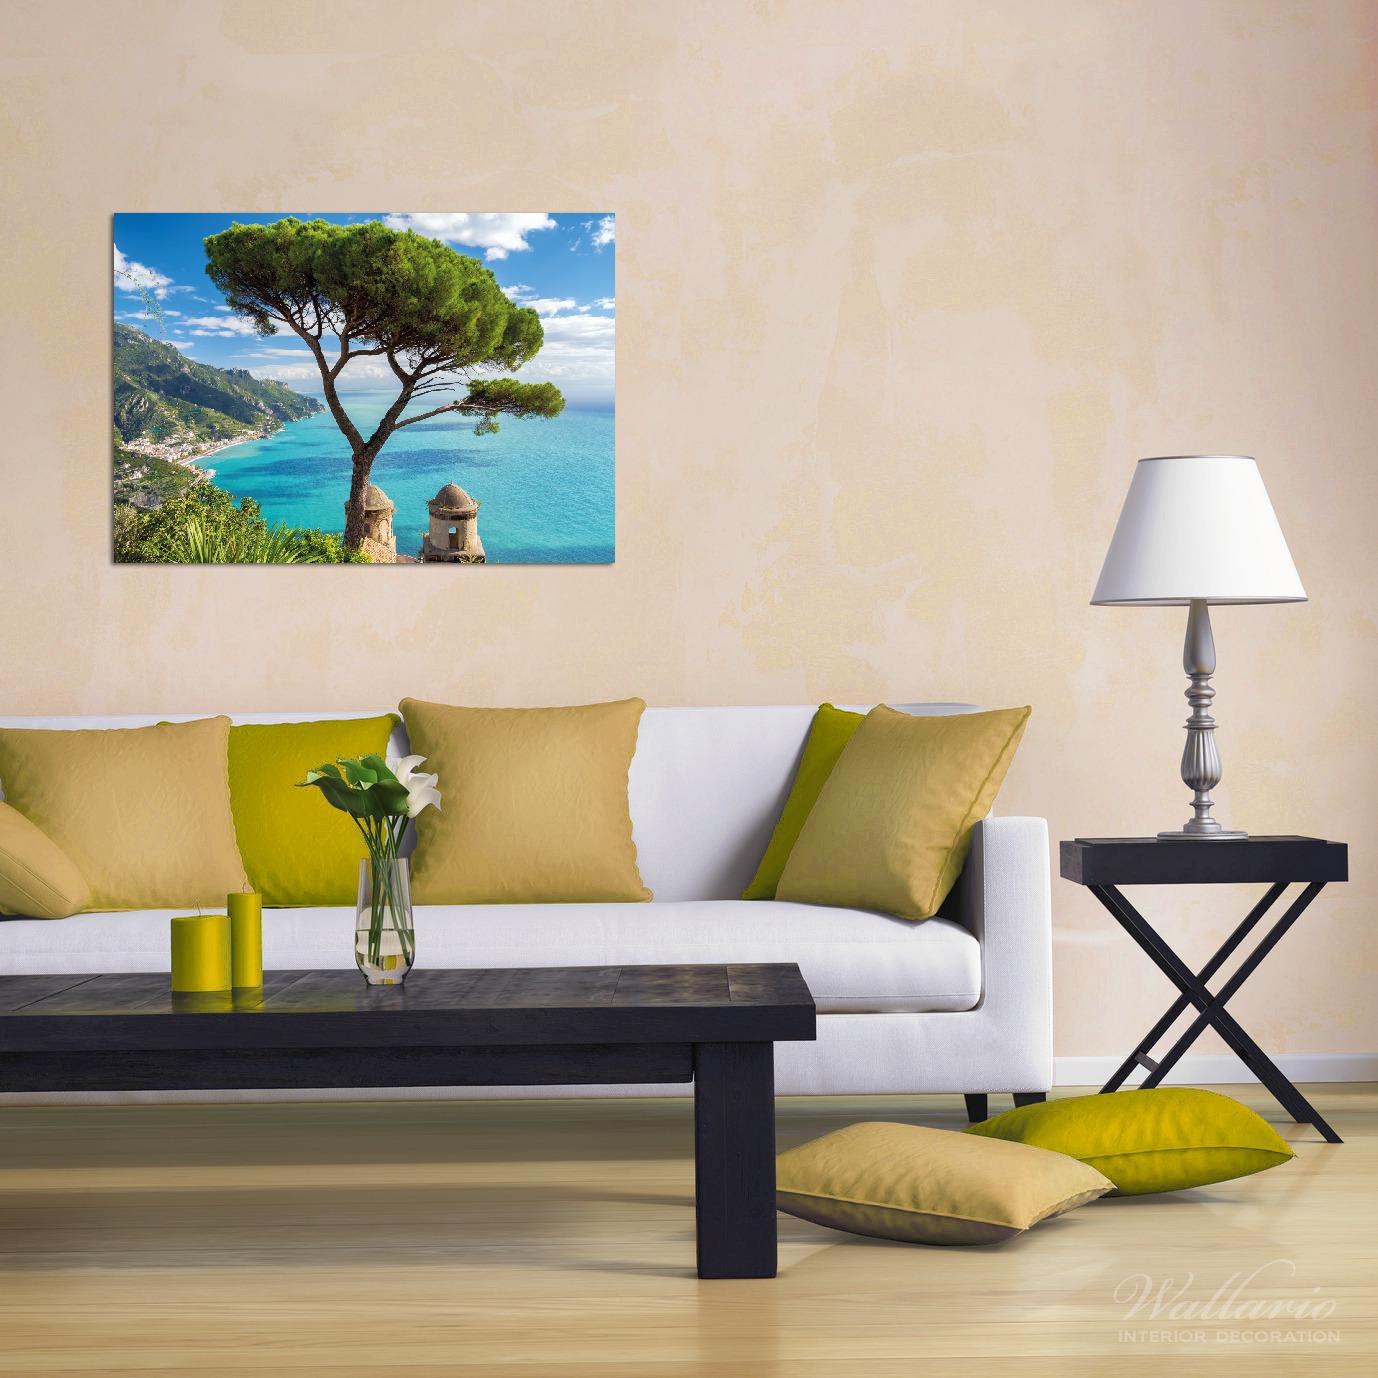 Wandbild Italienische Küste – Bild 2